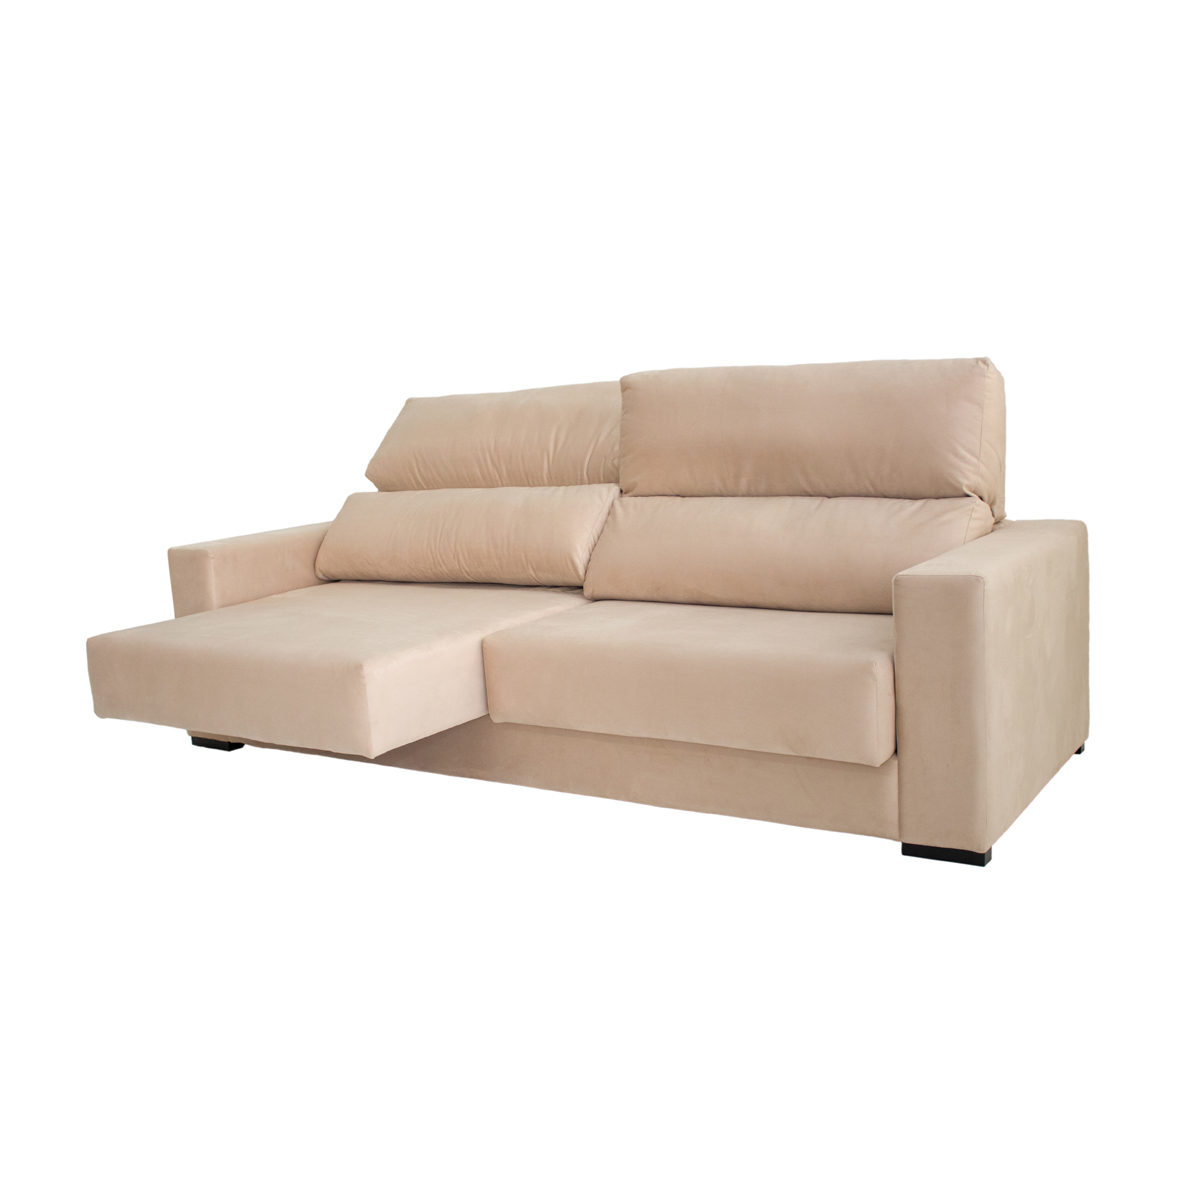 Sofá H900 (Retrátil e reclinável) (C)